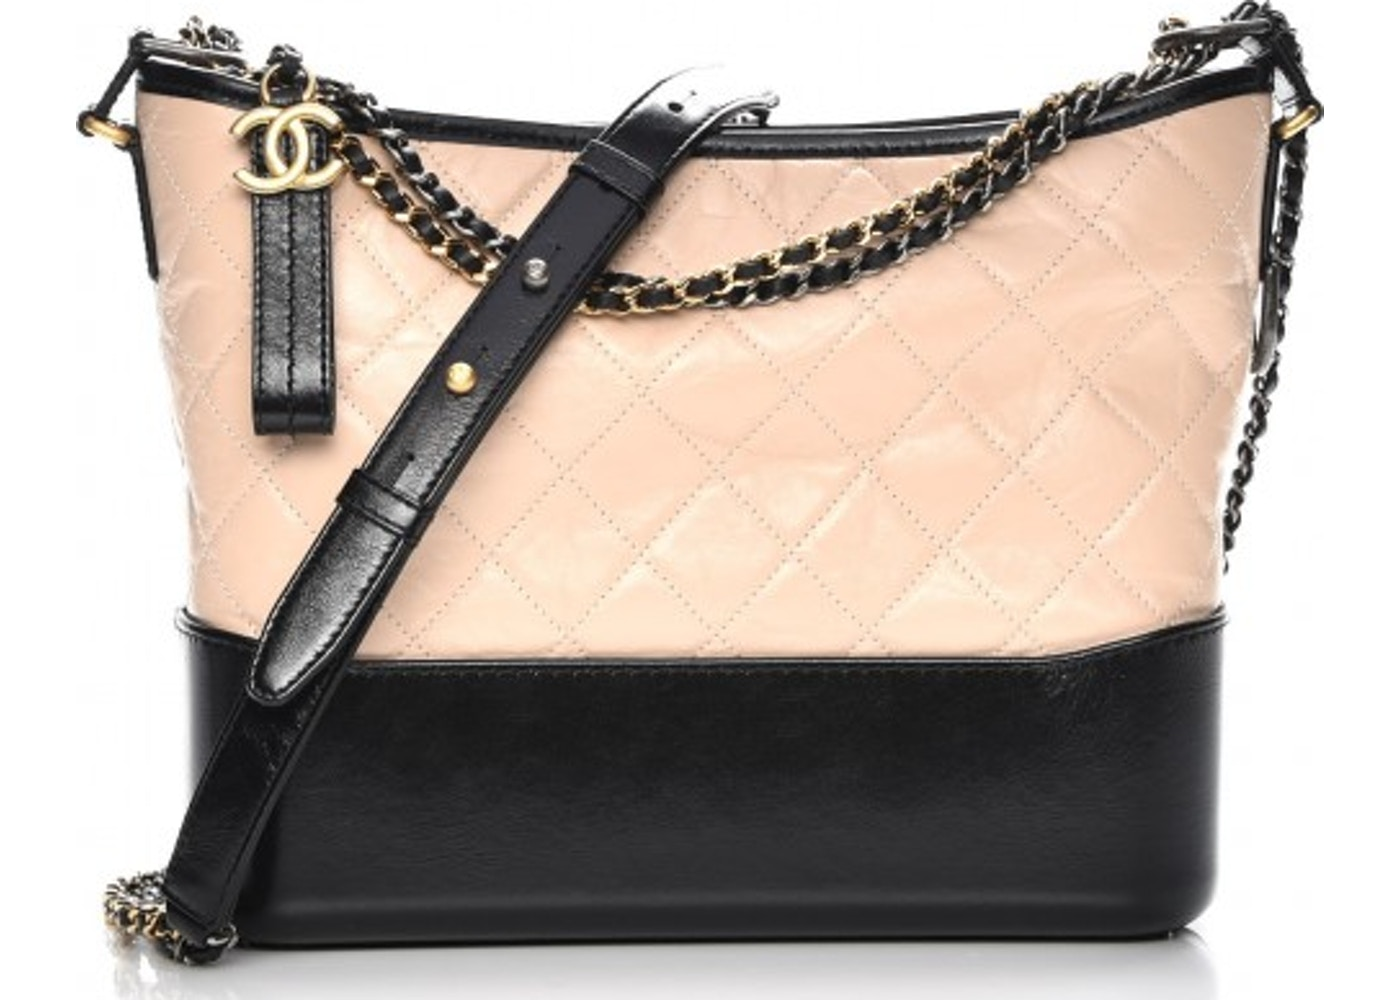 1595a0fa83e6 Chanel Gabrielle Hobo Quilted Diamond Medium Beige/Black. Quilted Diamond  Medium Beige/Black